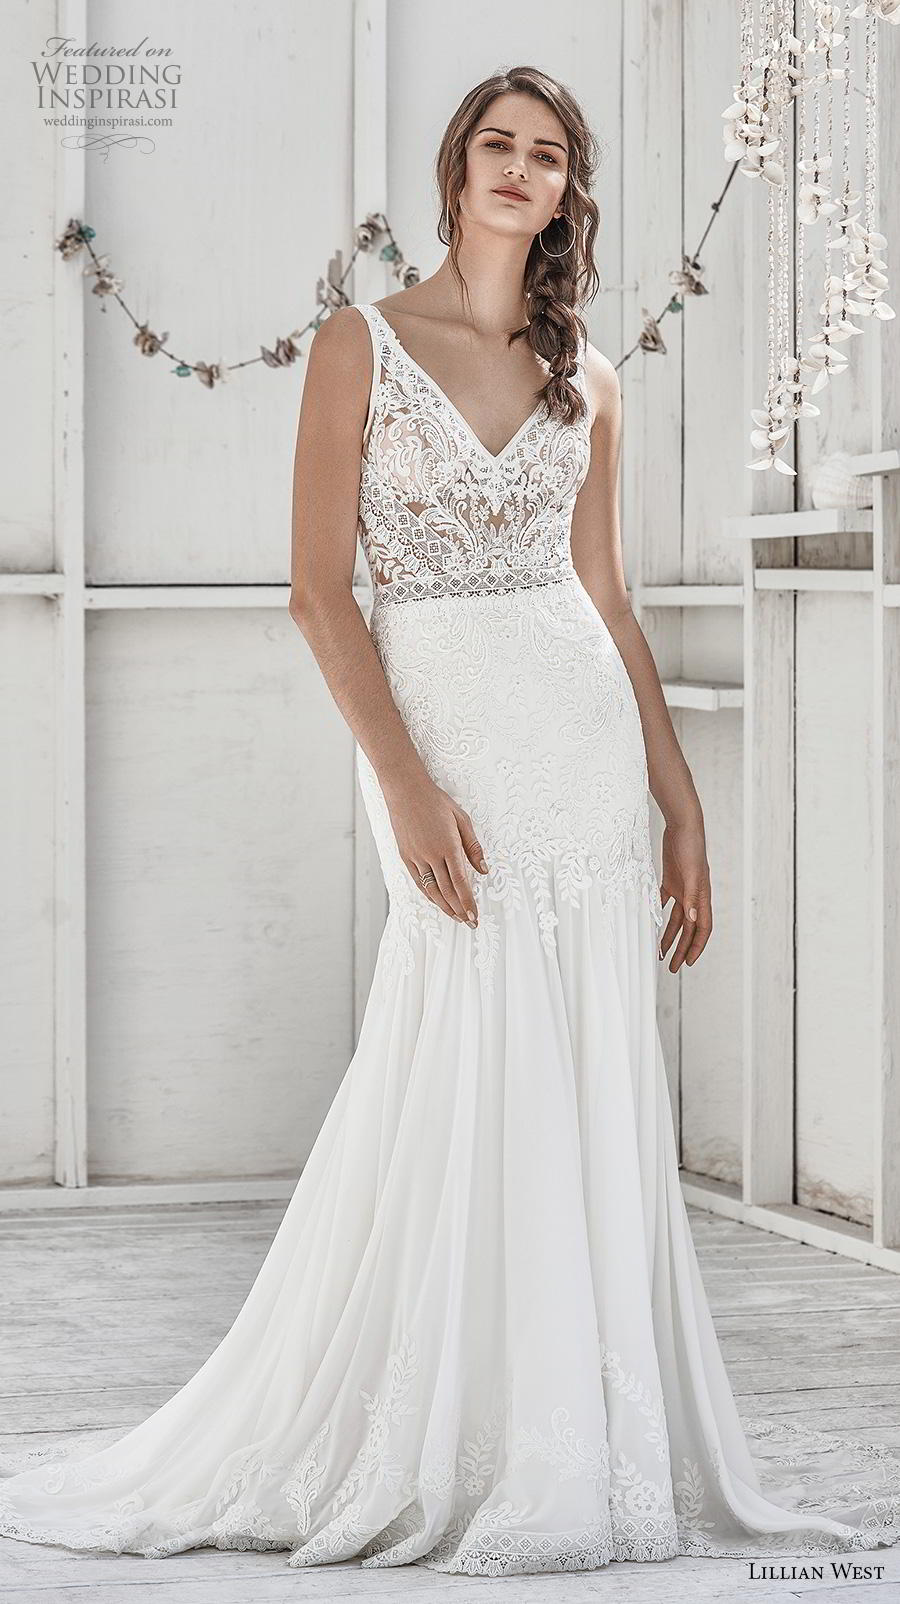 lillian west spring 2019 bridal sleeveless with strap v neck heavily embellished bodice elegant trumpet wedding dress backless v back medium train (3) mv